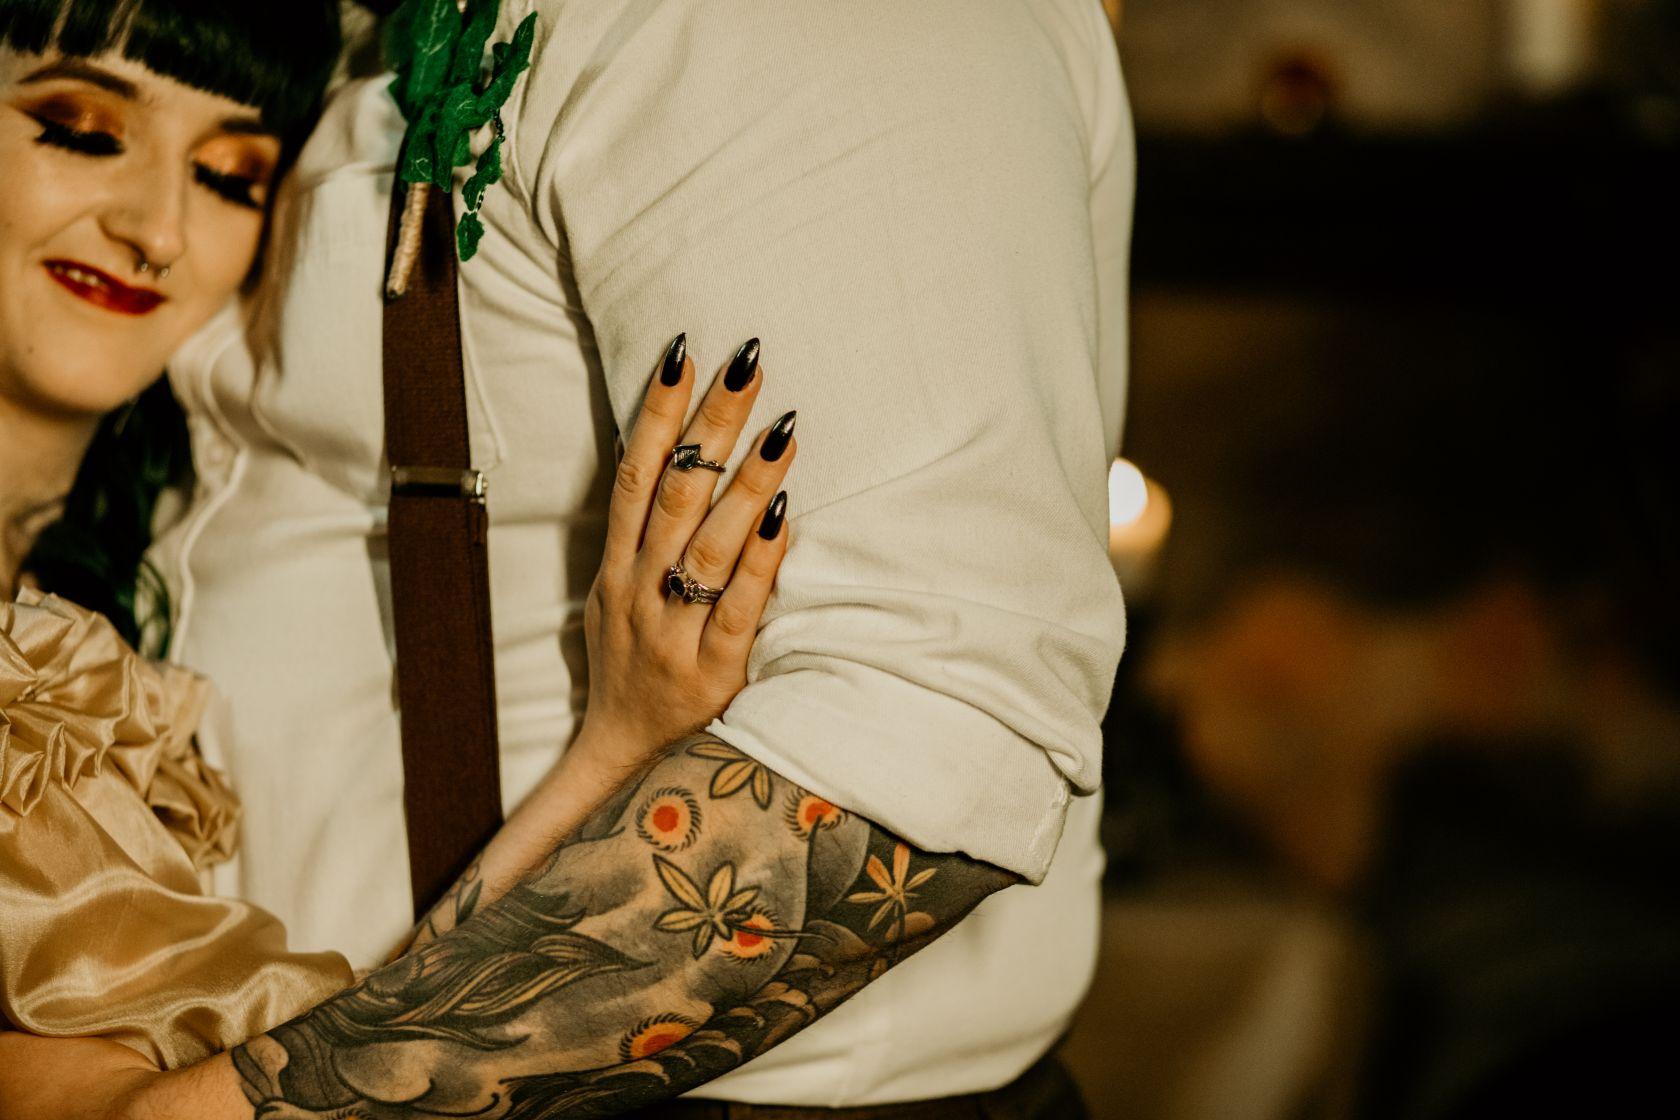 alternative fairytale wedding- snow white wedding- charlotte laurie designs-chloe mary photo- unconventional wedding- alternative wedding inspiration- tattooed wedding